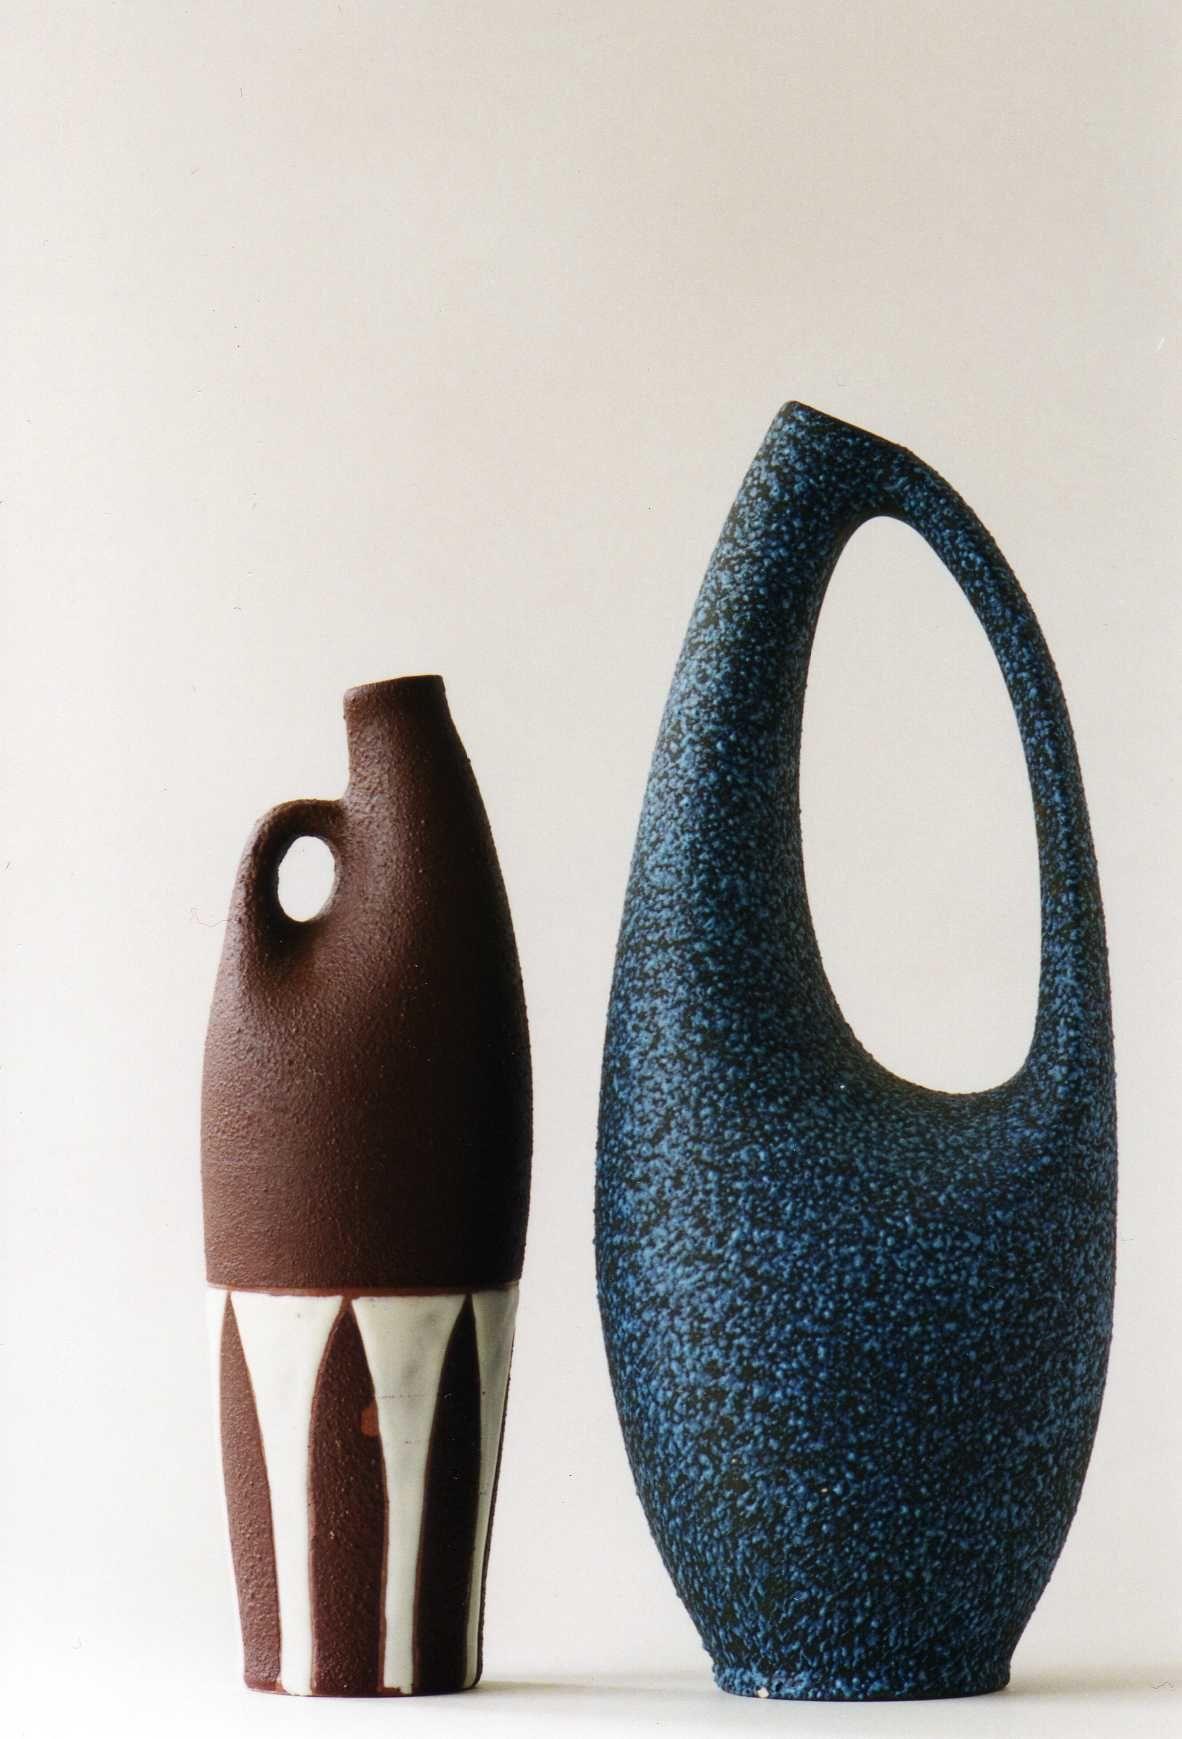 bauhaus vase google search vase bauhaus pinterest bauhaus google and pottery. Black Bedroom Furniture Sets. Home Design Ideas